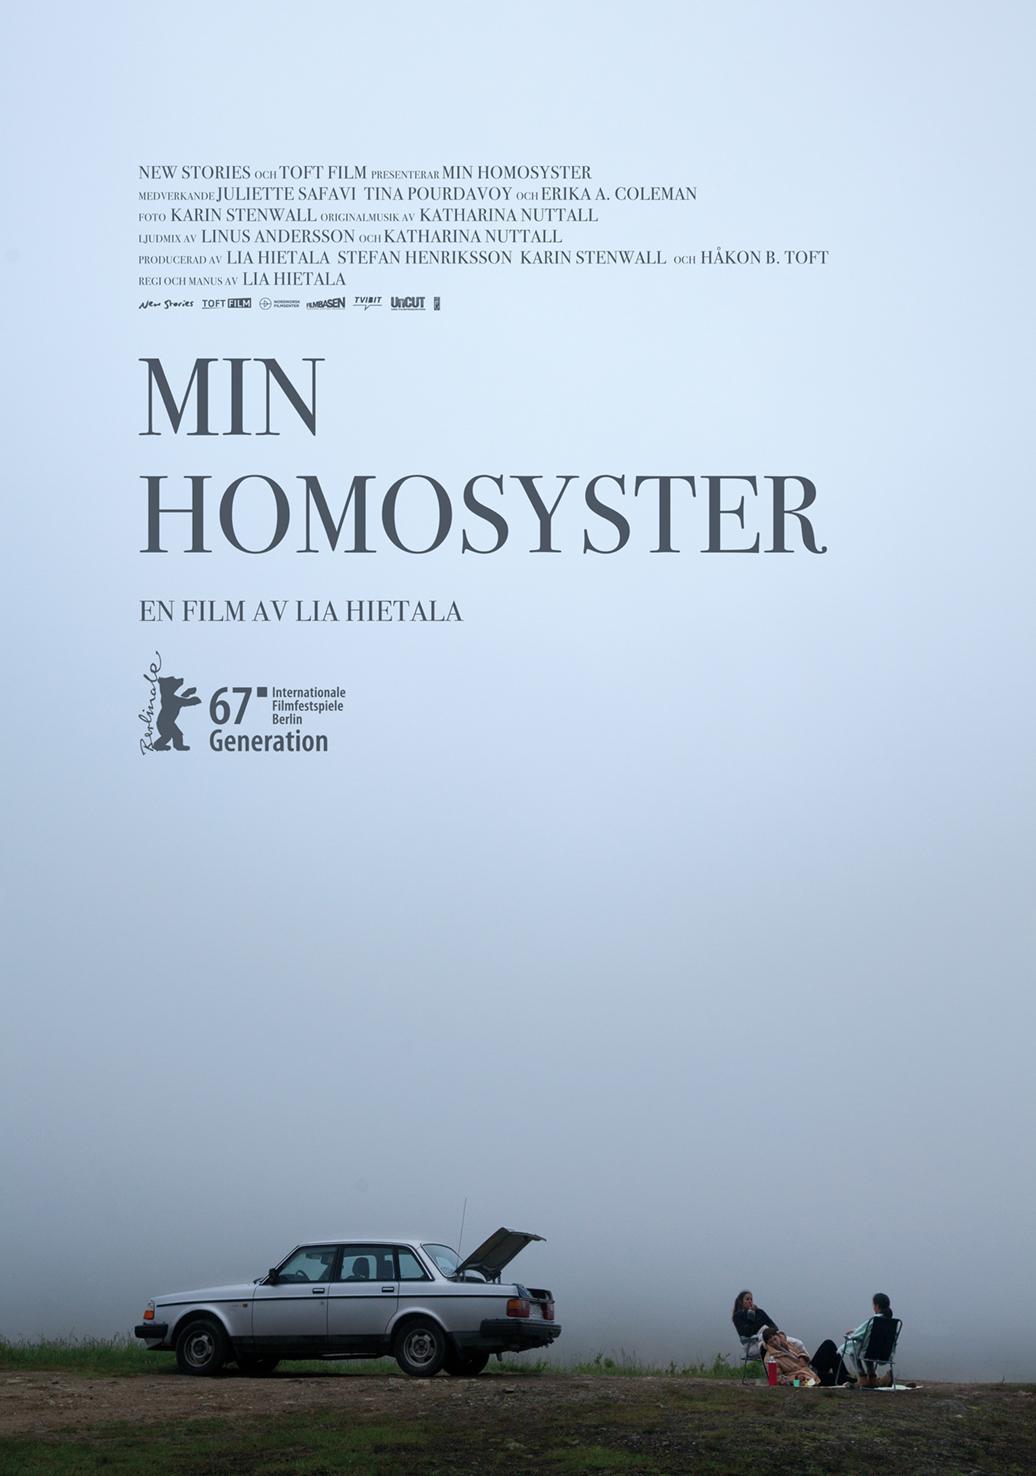 MGS-POSTER-SWE-2.jpg